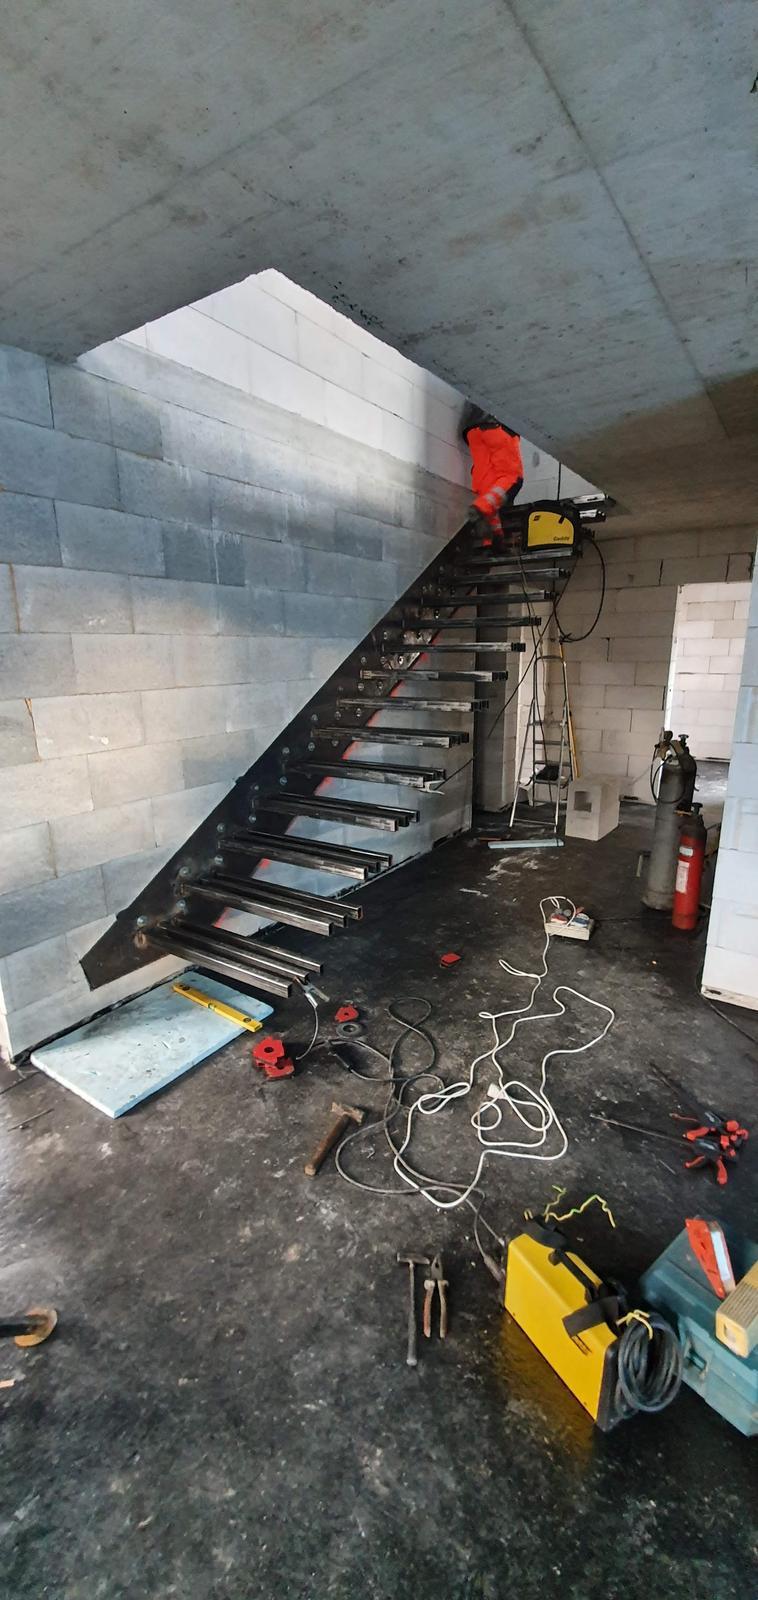 Konzolove schodisko (samonosne schody) - blizime sa k finale